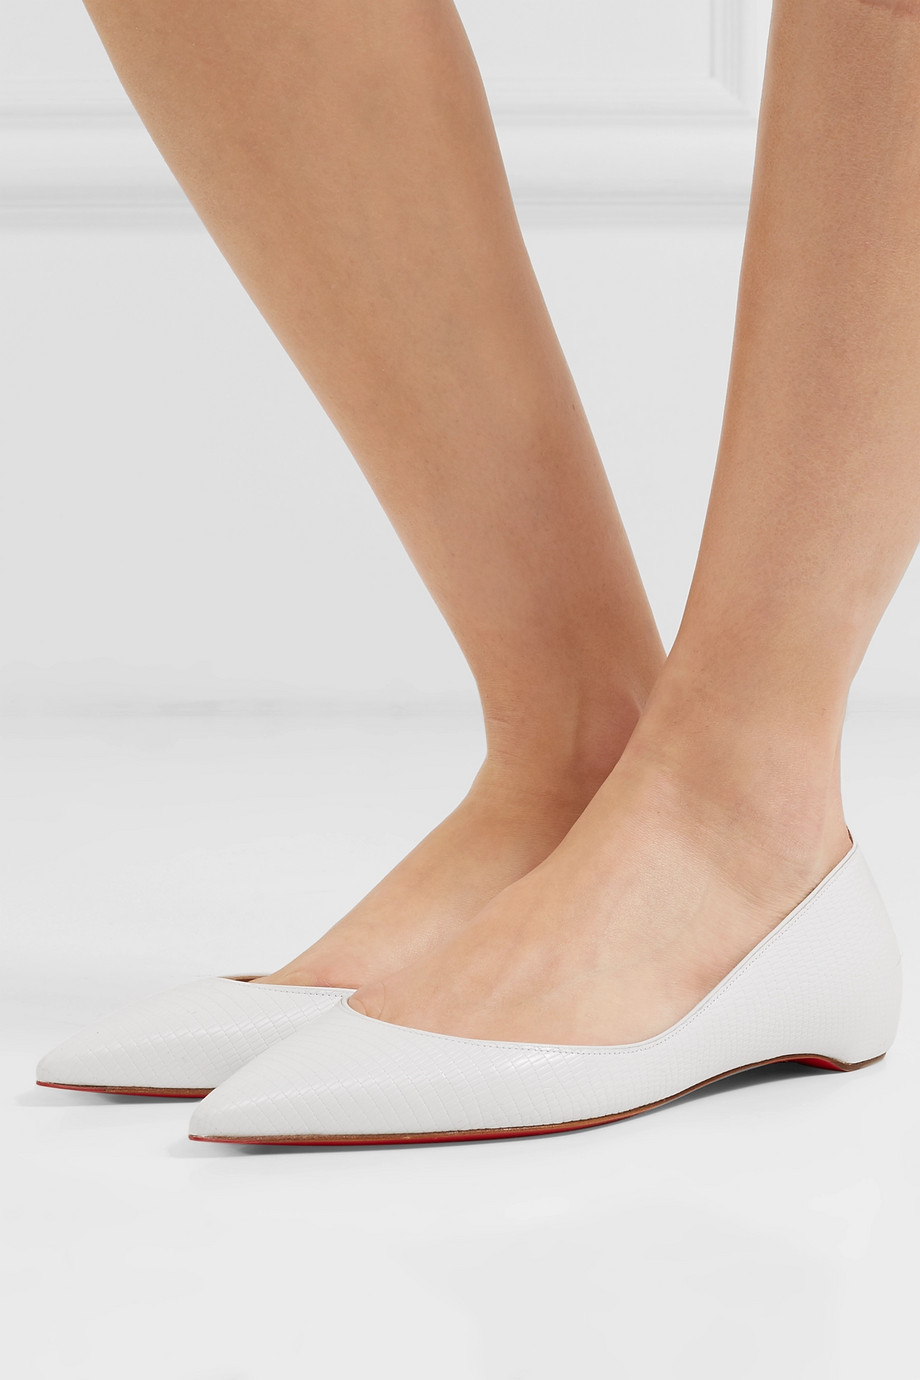 Christian Louboutin Iriza lizard-effect leather point-toe flats